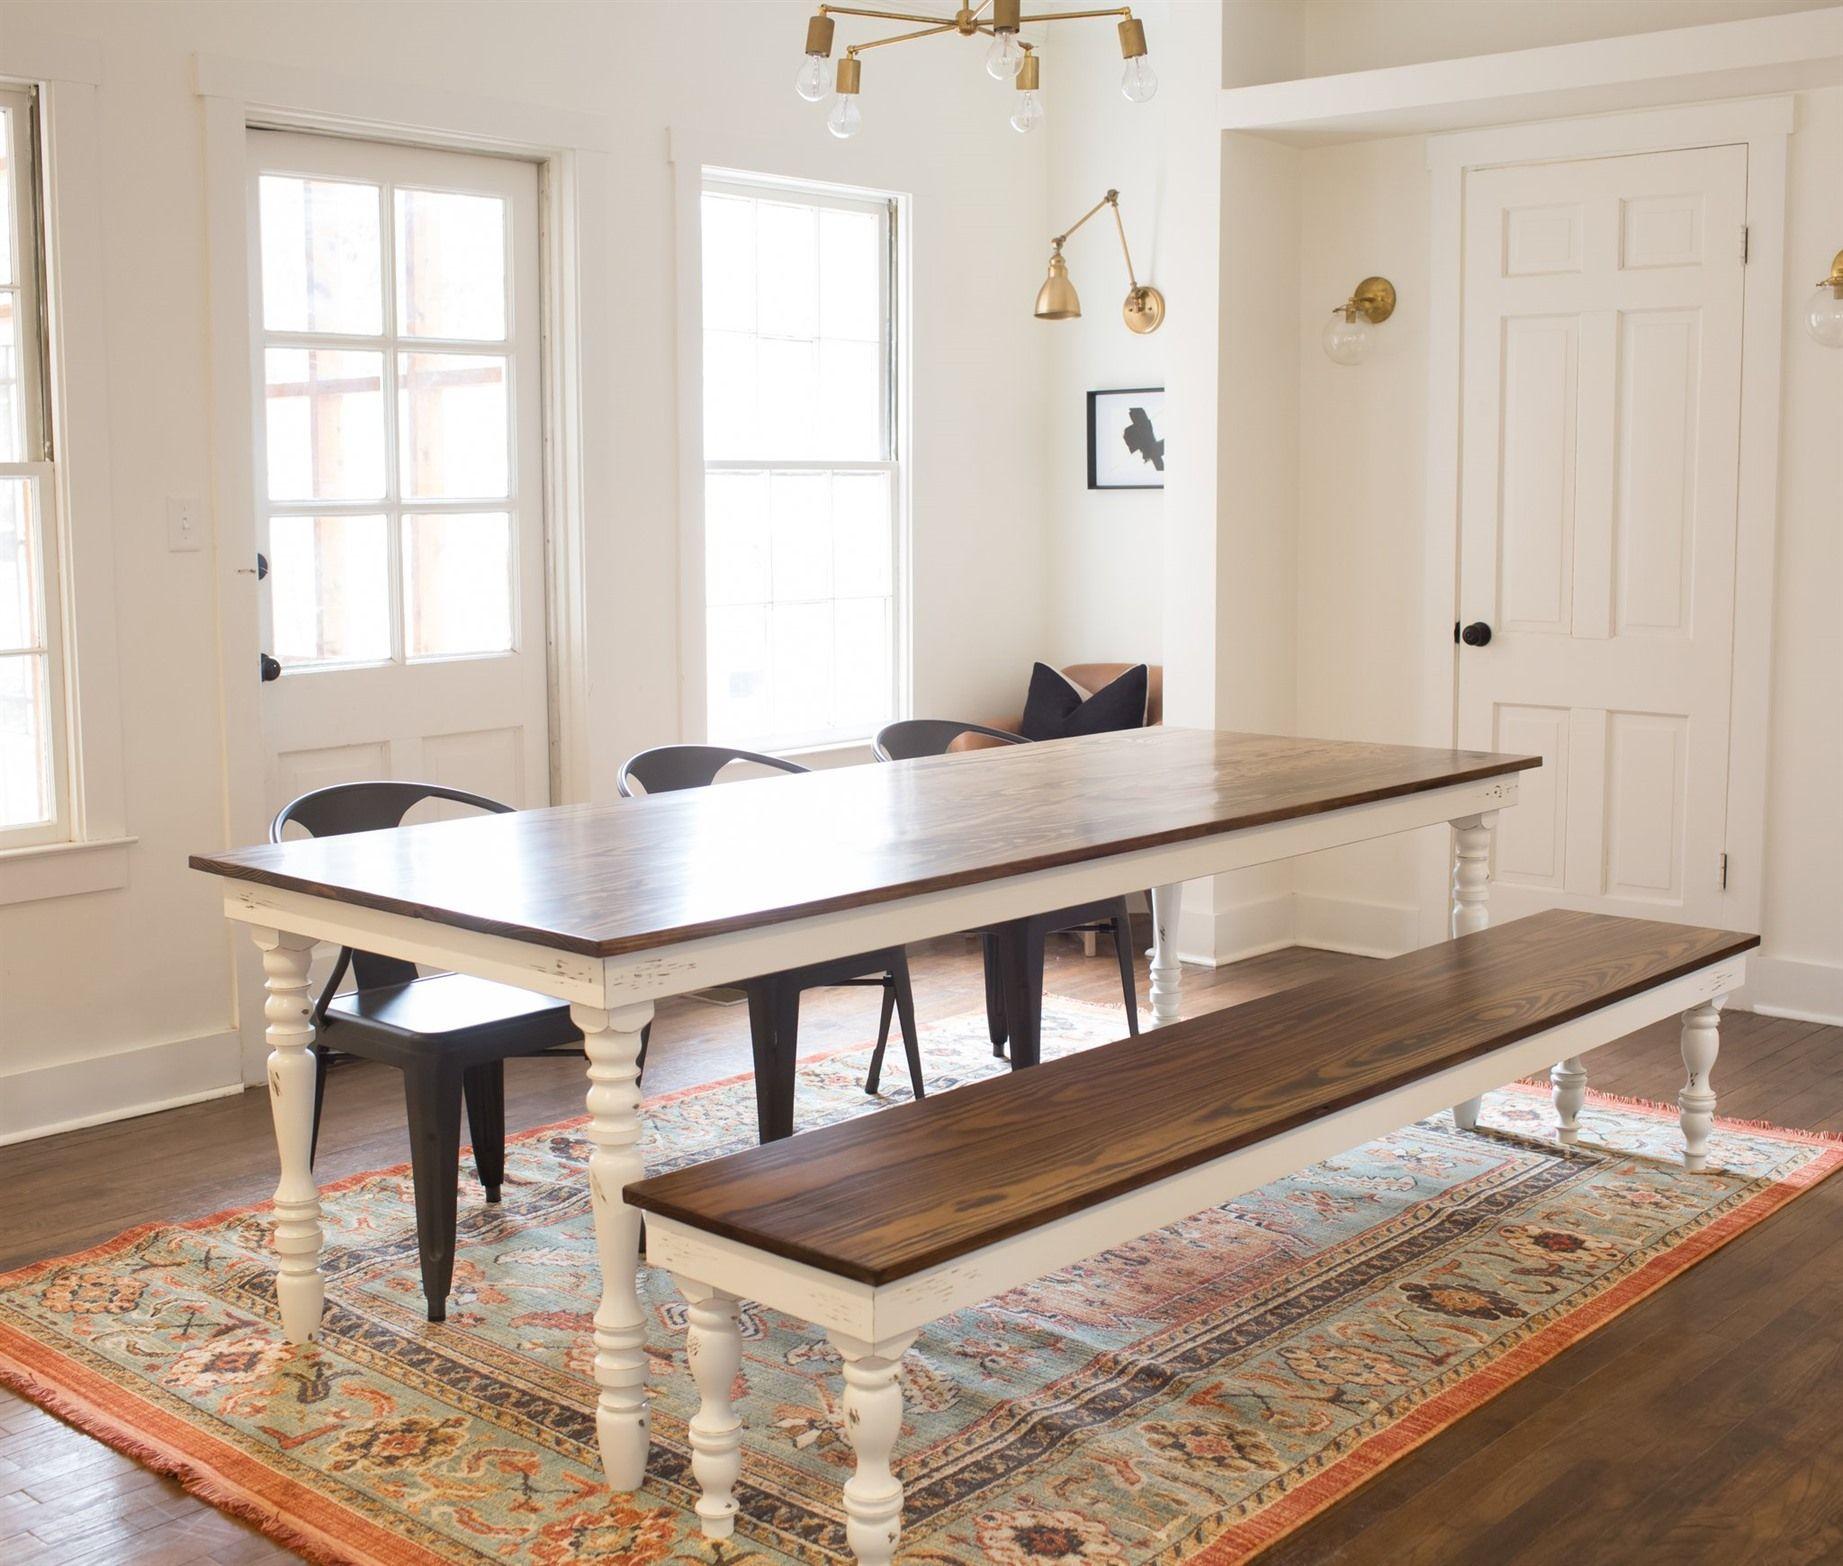 Beau 24+ Inexpensive Farmhouse Table Ideas | Cool Tables ...